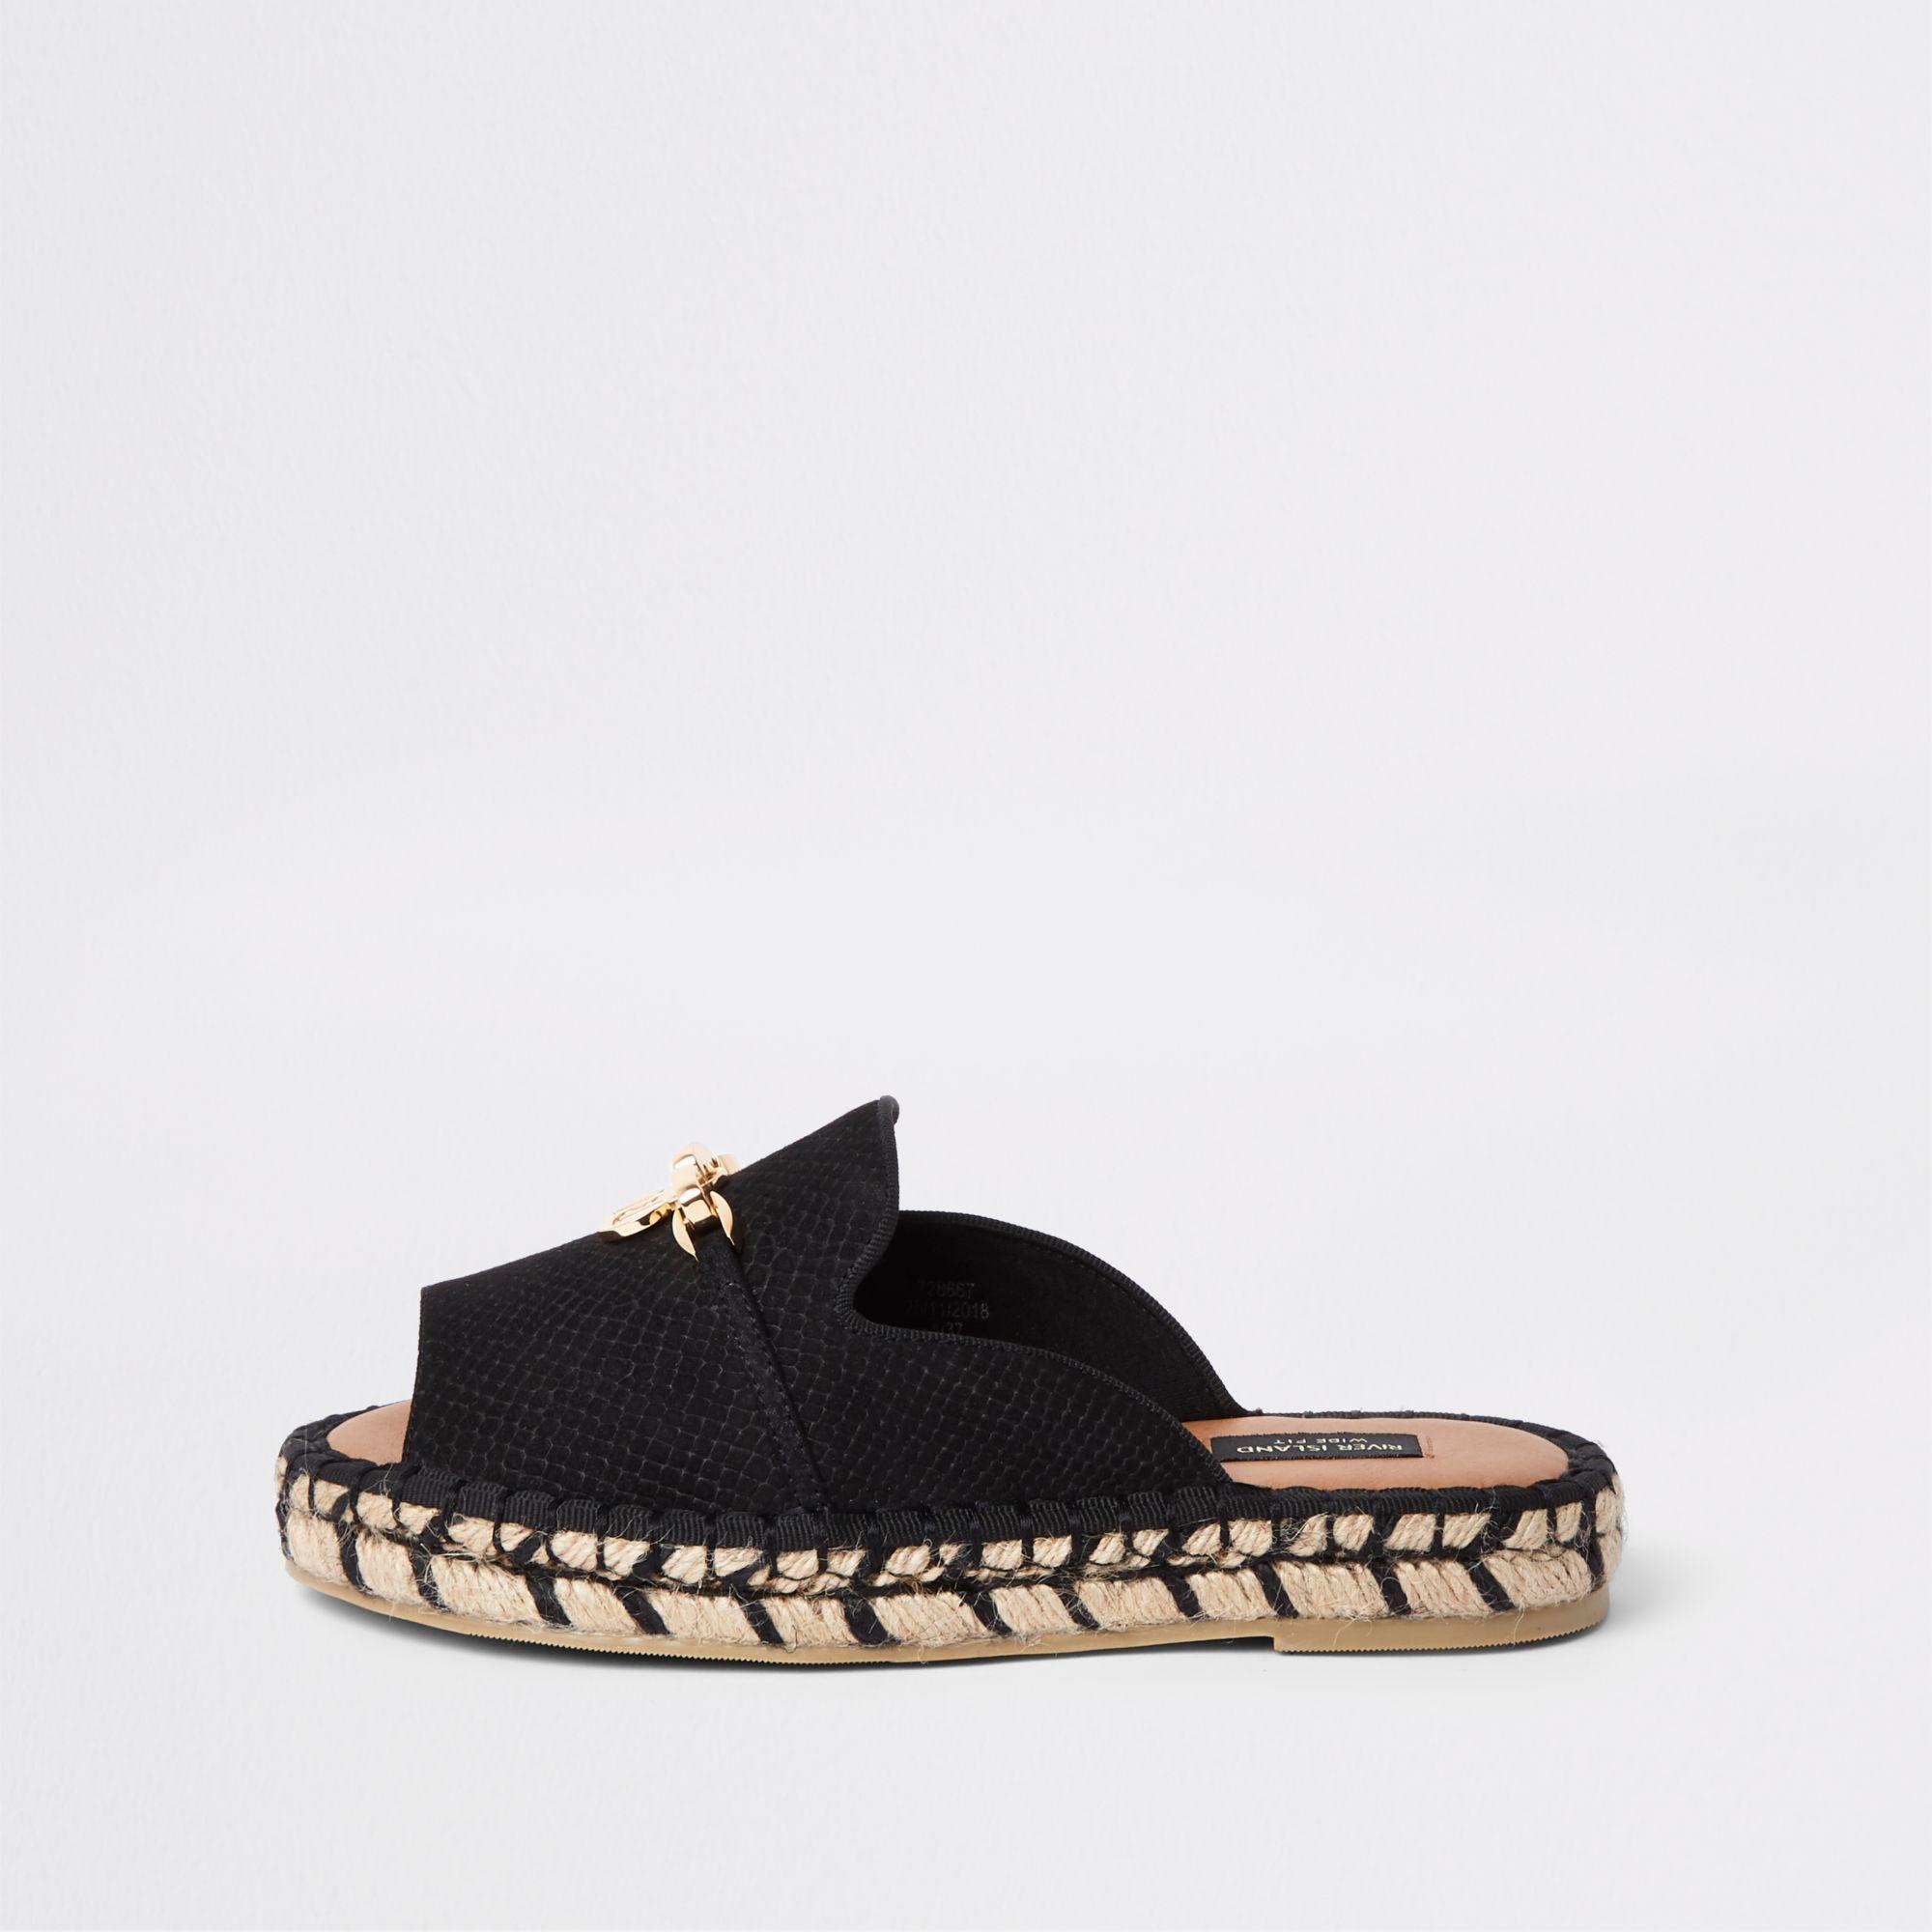 82983c60255 Lyst - River Island Espadrille Peep Toe Wide Fit Sandals in Black